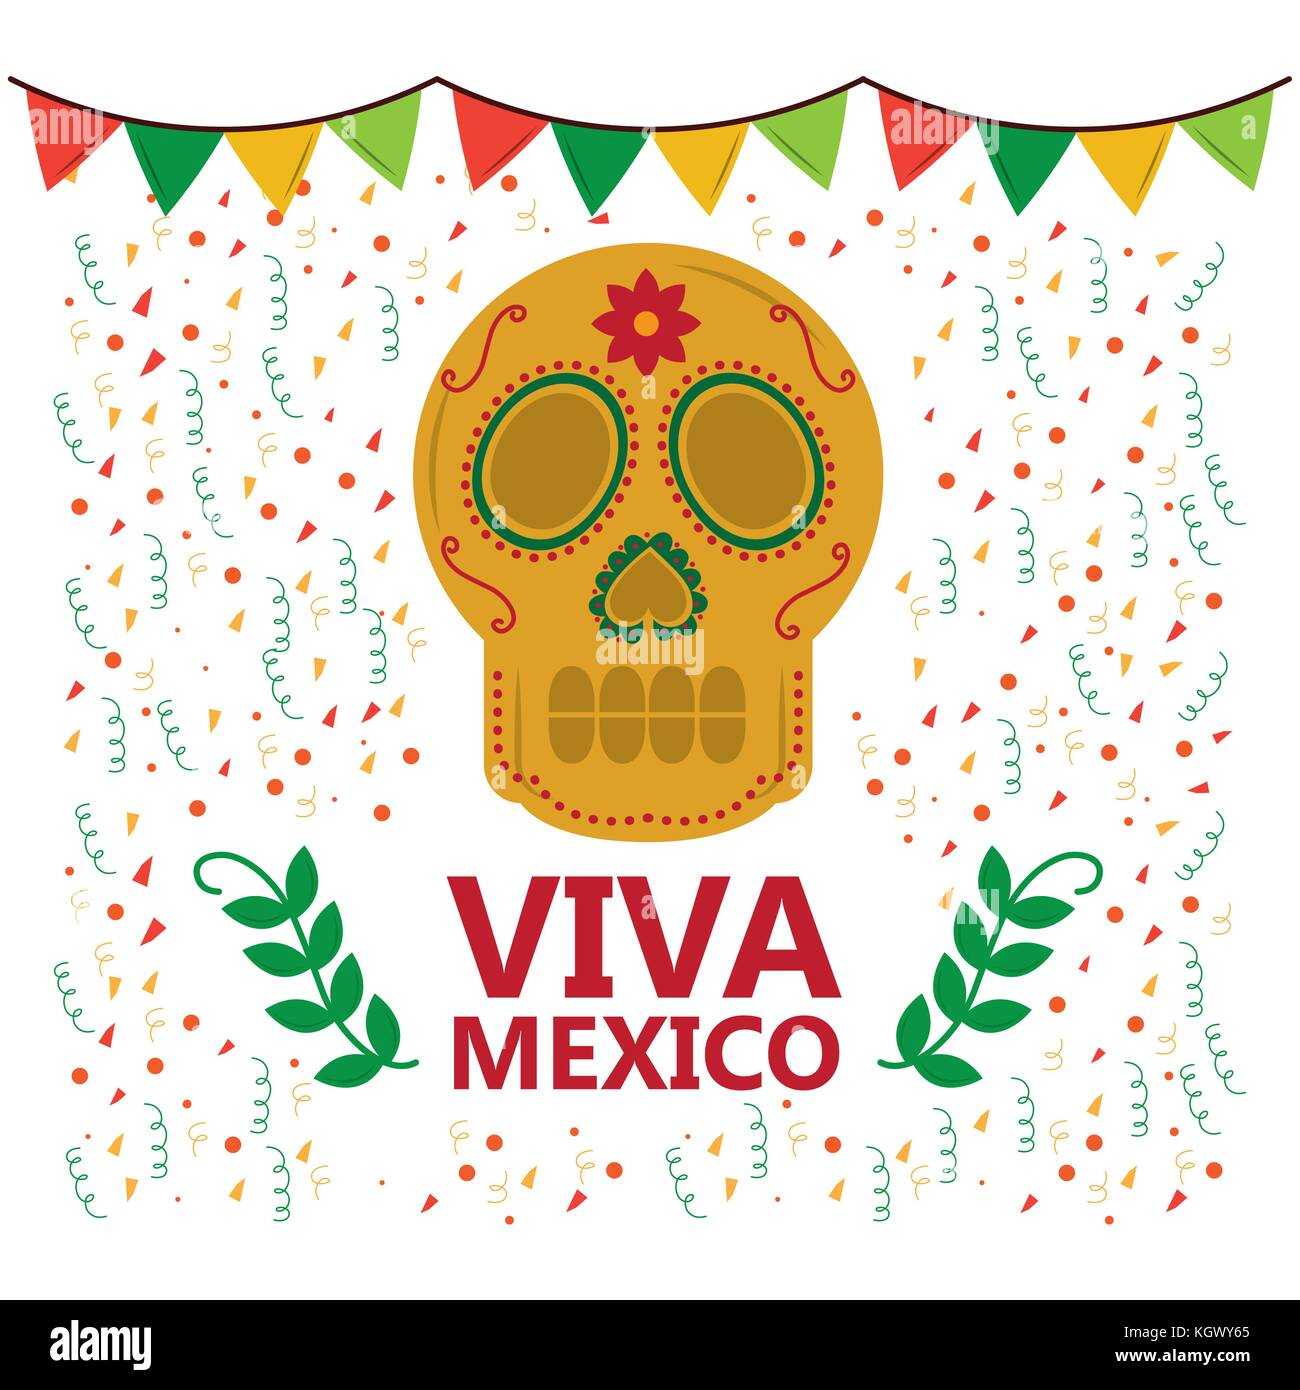 viva mexico skull pennant confetti laurel decoration - Stock Image